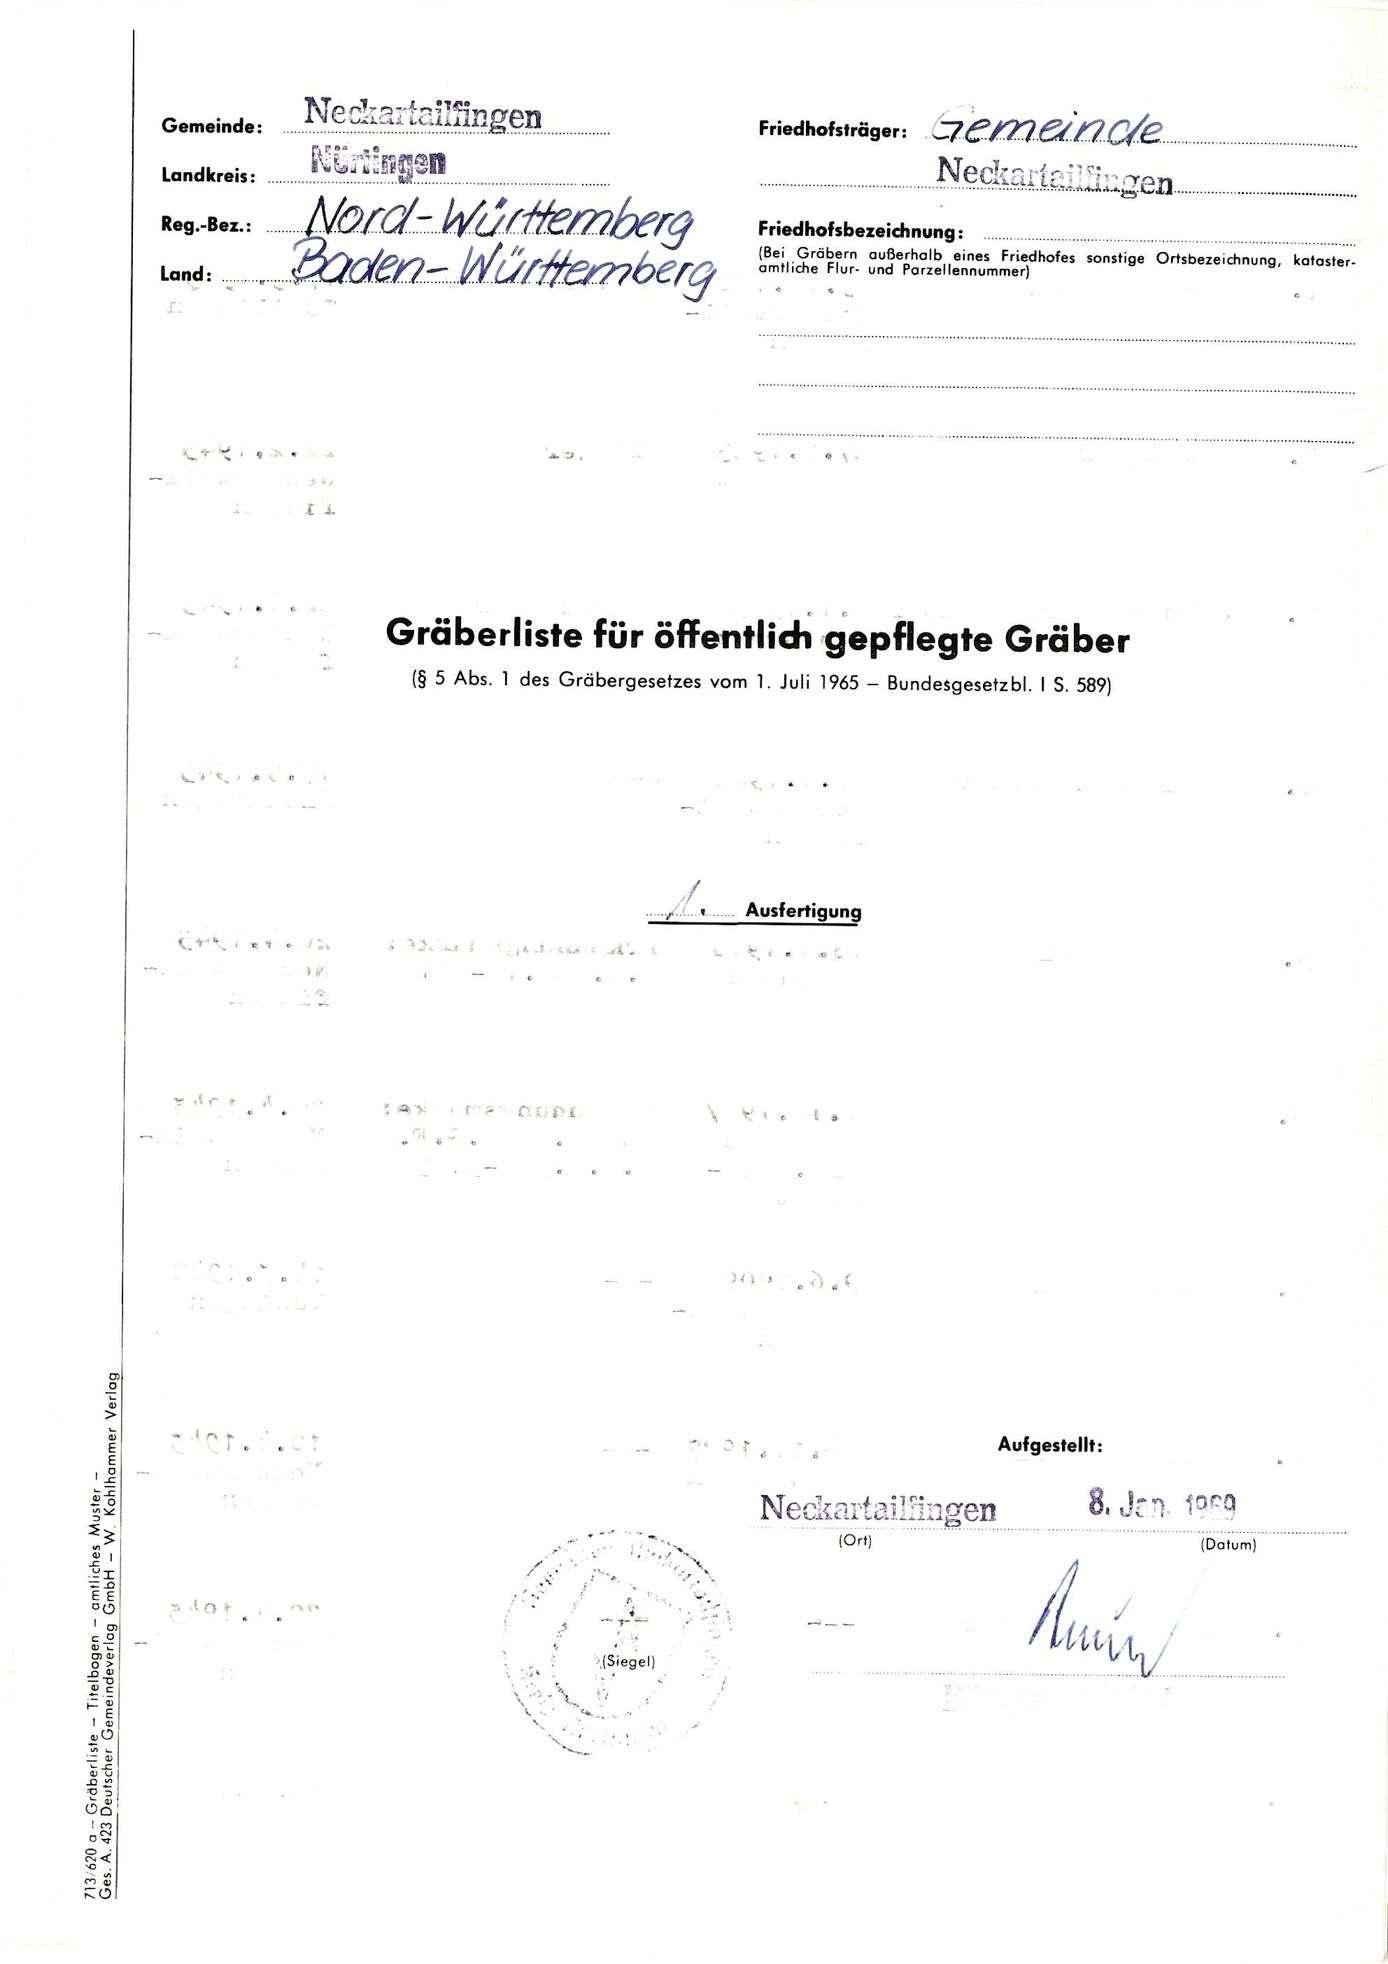 Gemeindefriedhof Neckartailfingen, Bild 1